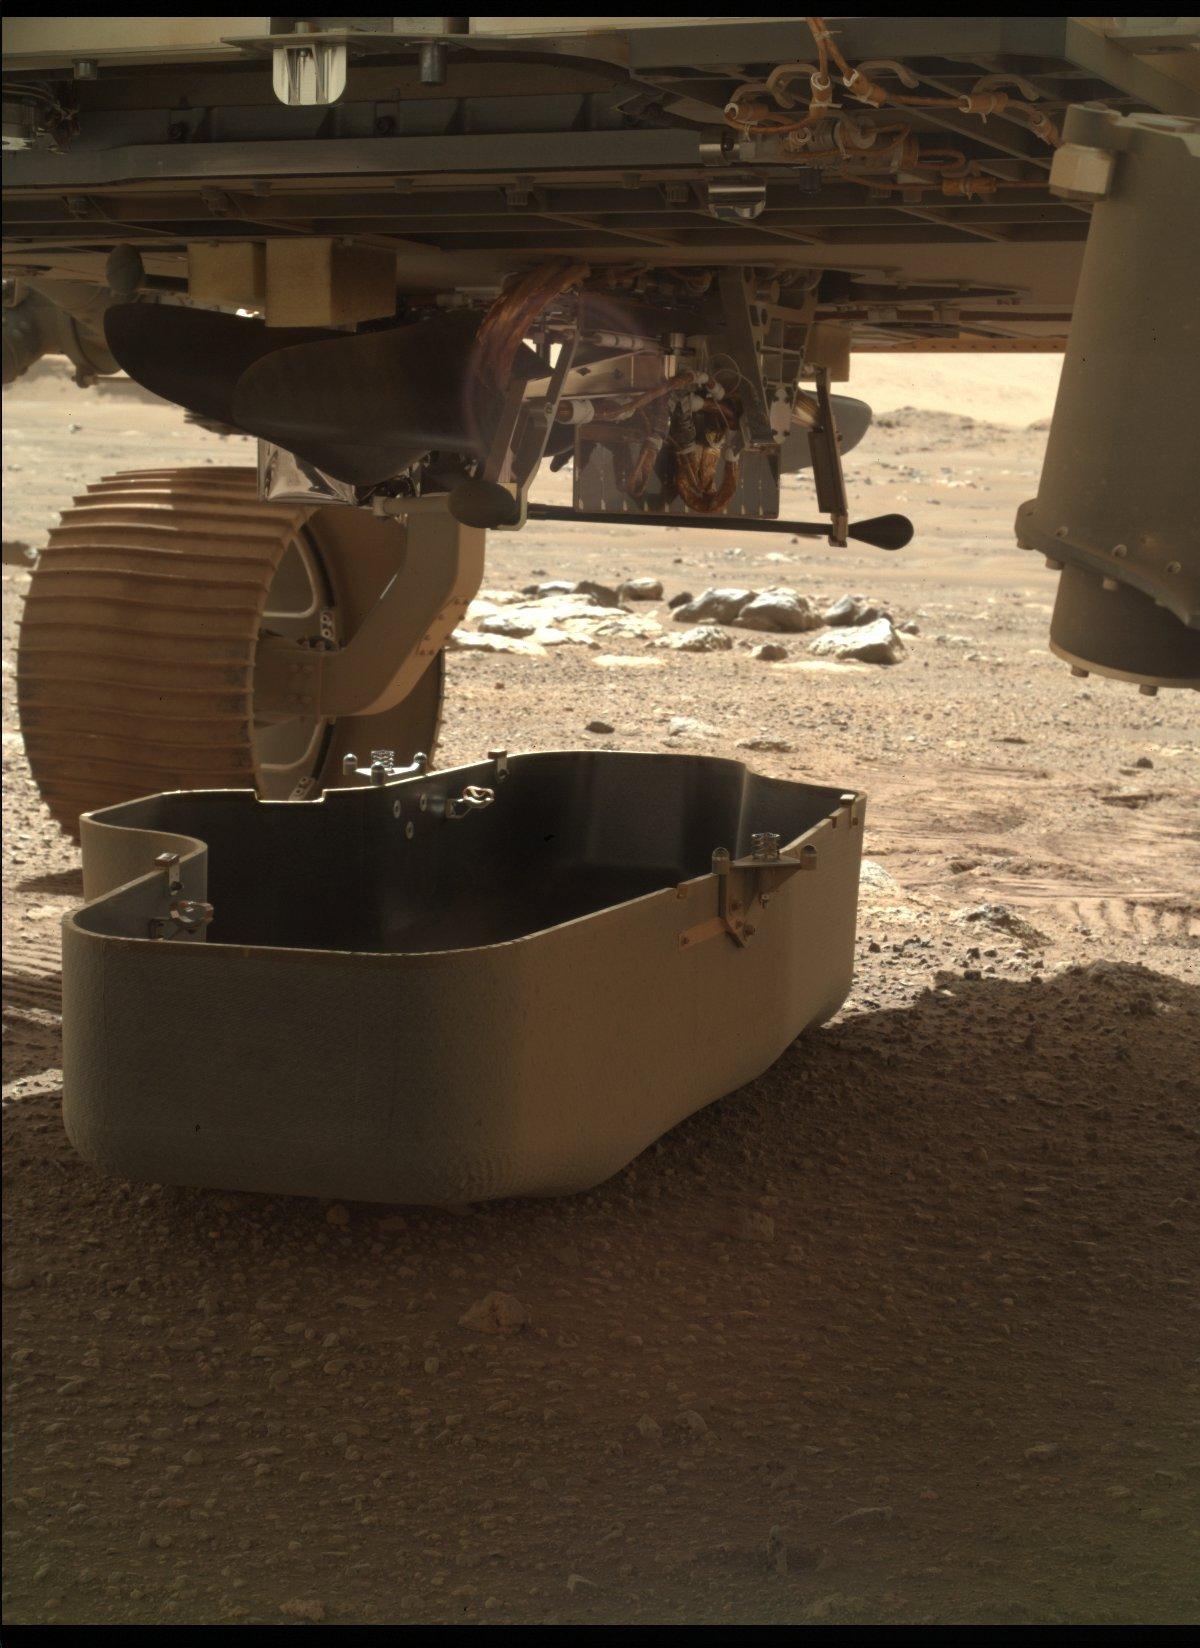 Ingenuity Perseverance cache sol © NASA/JPL-Caltech